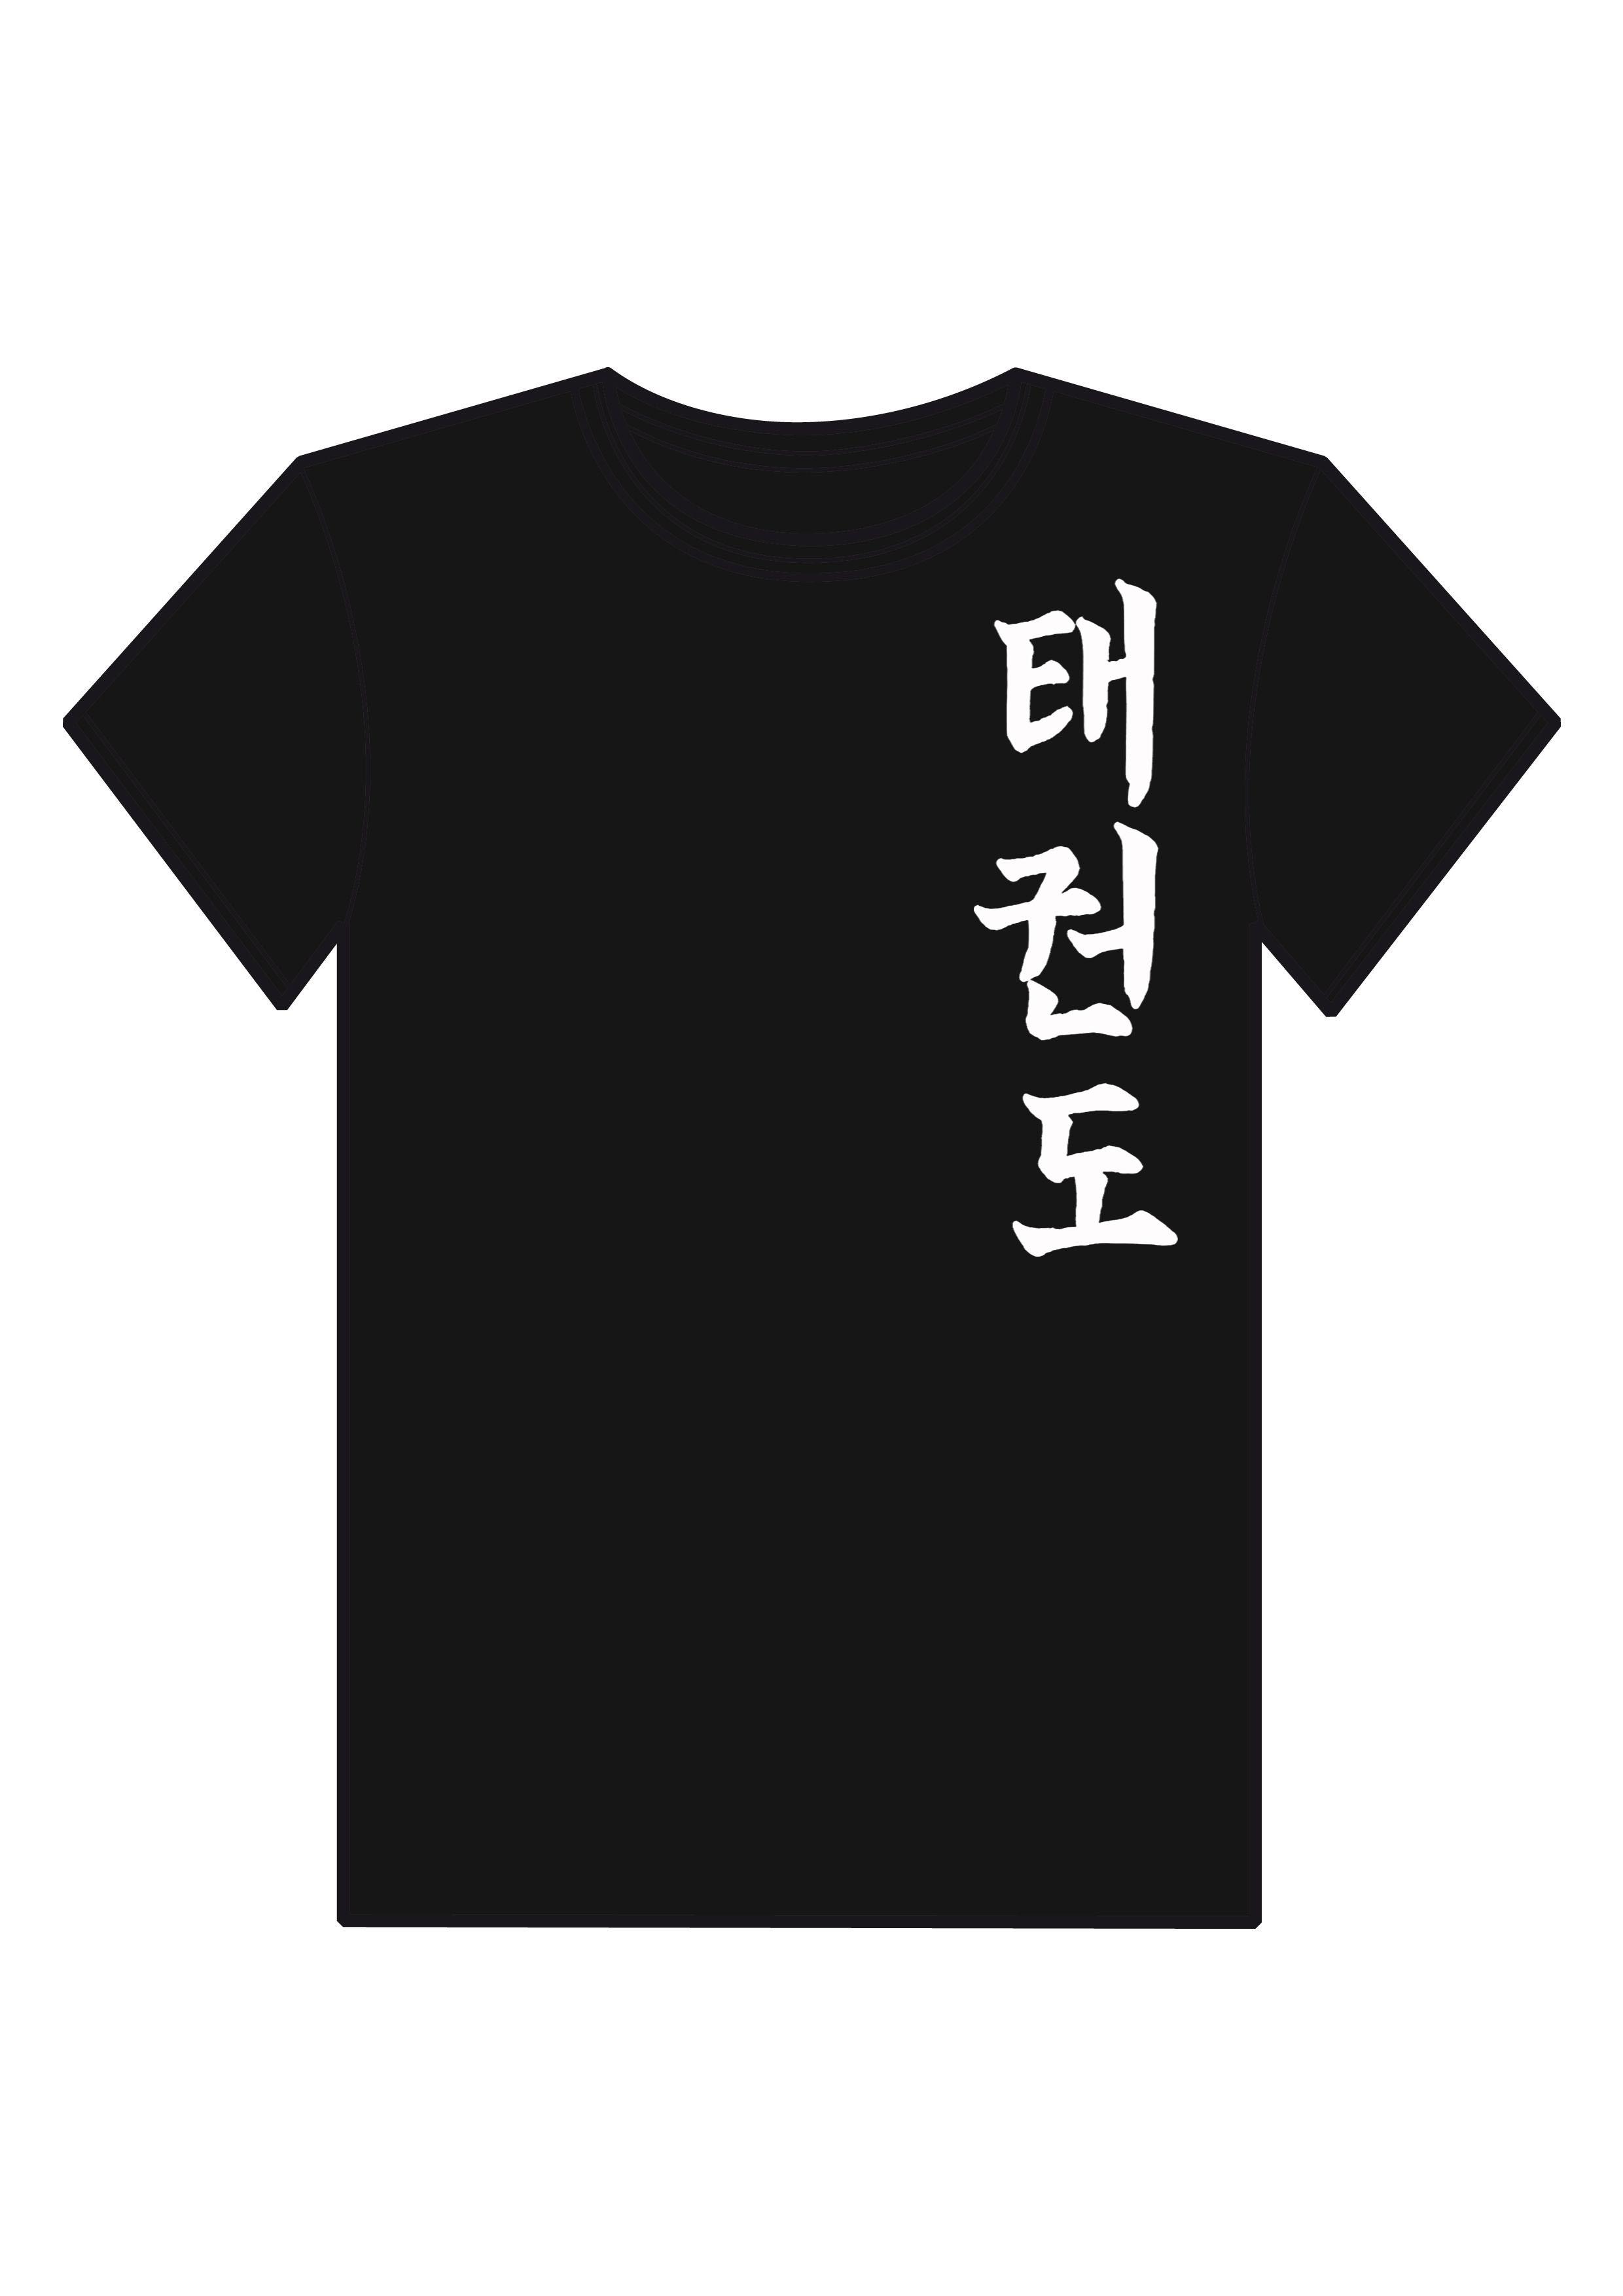 koszulka tkd 4 przod